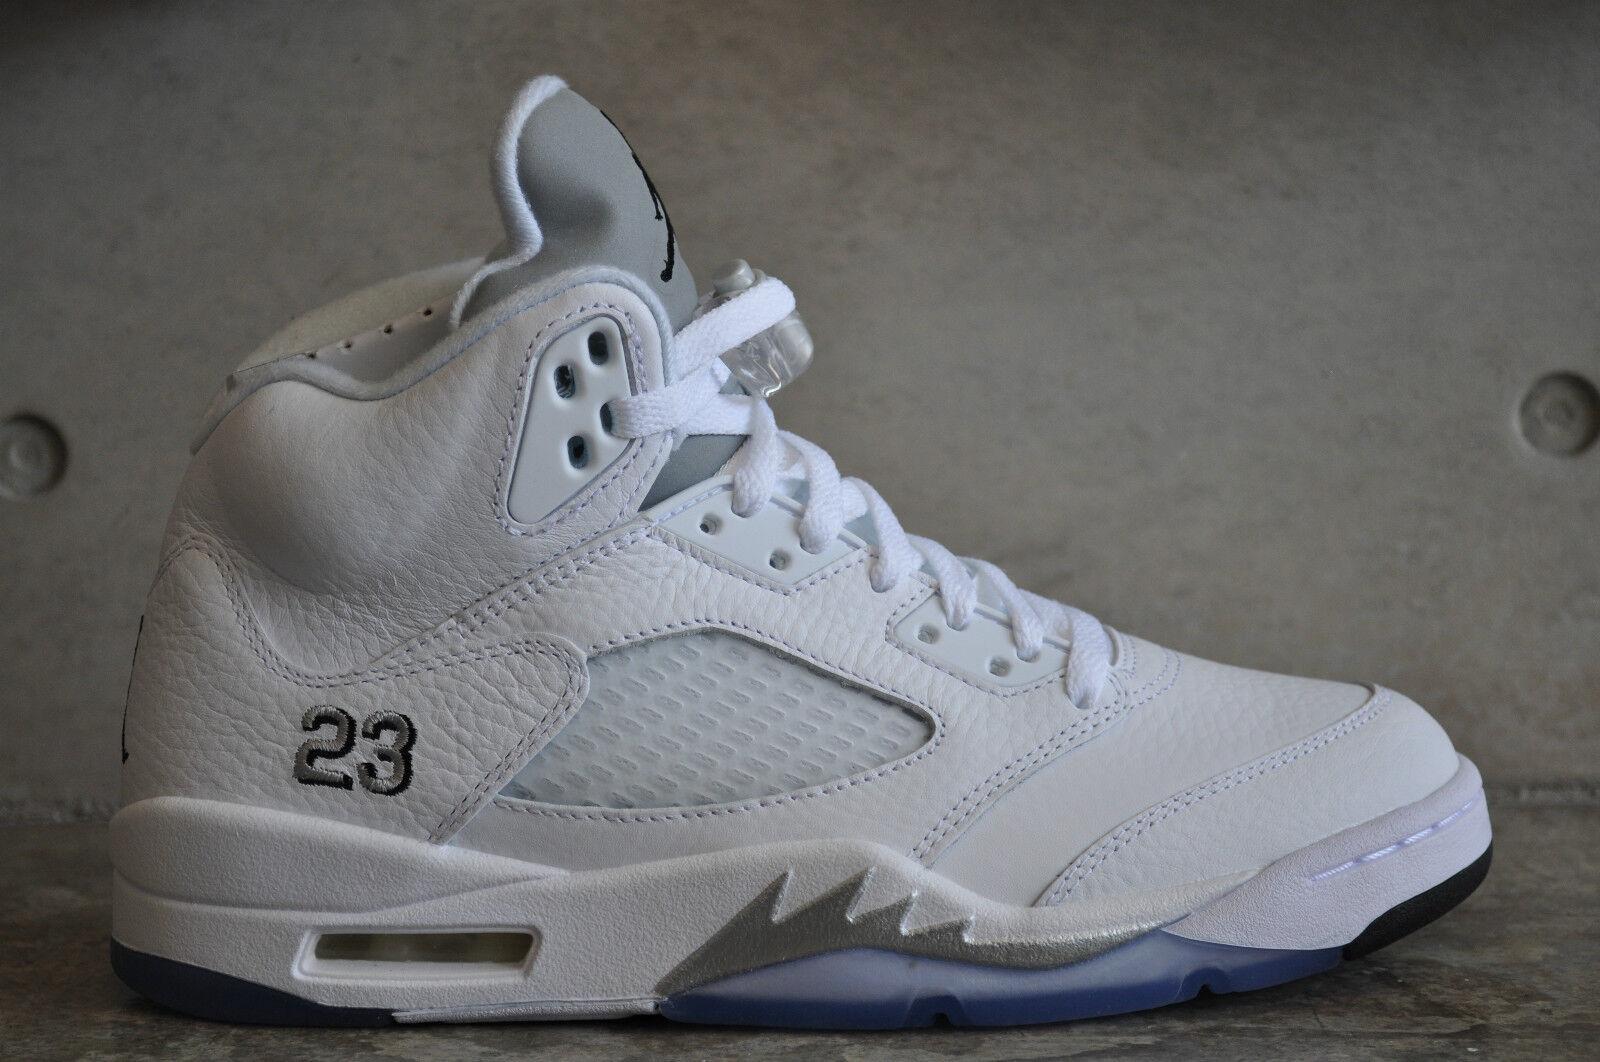 Nike Air Jordan 5